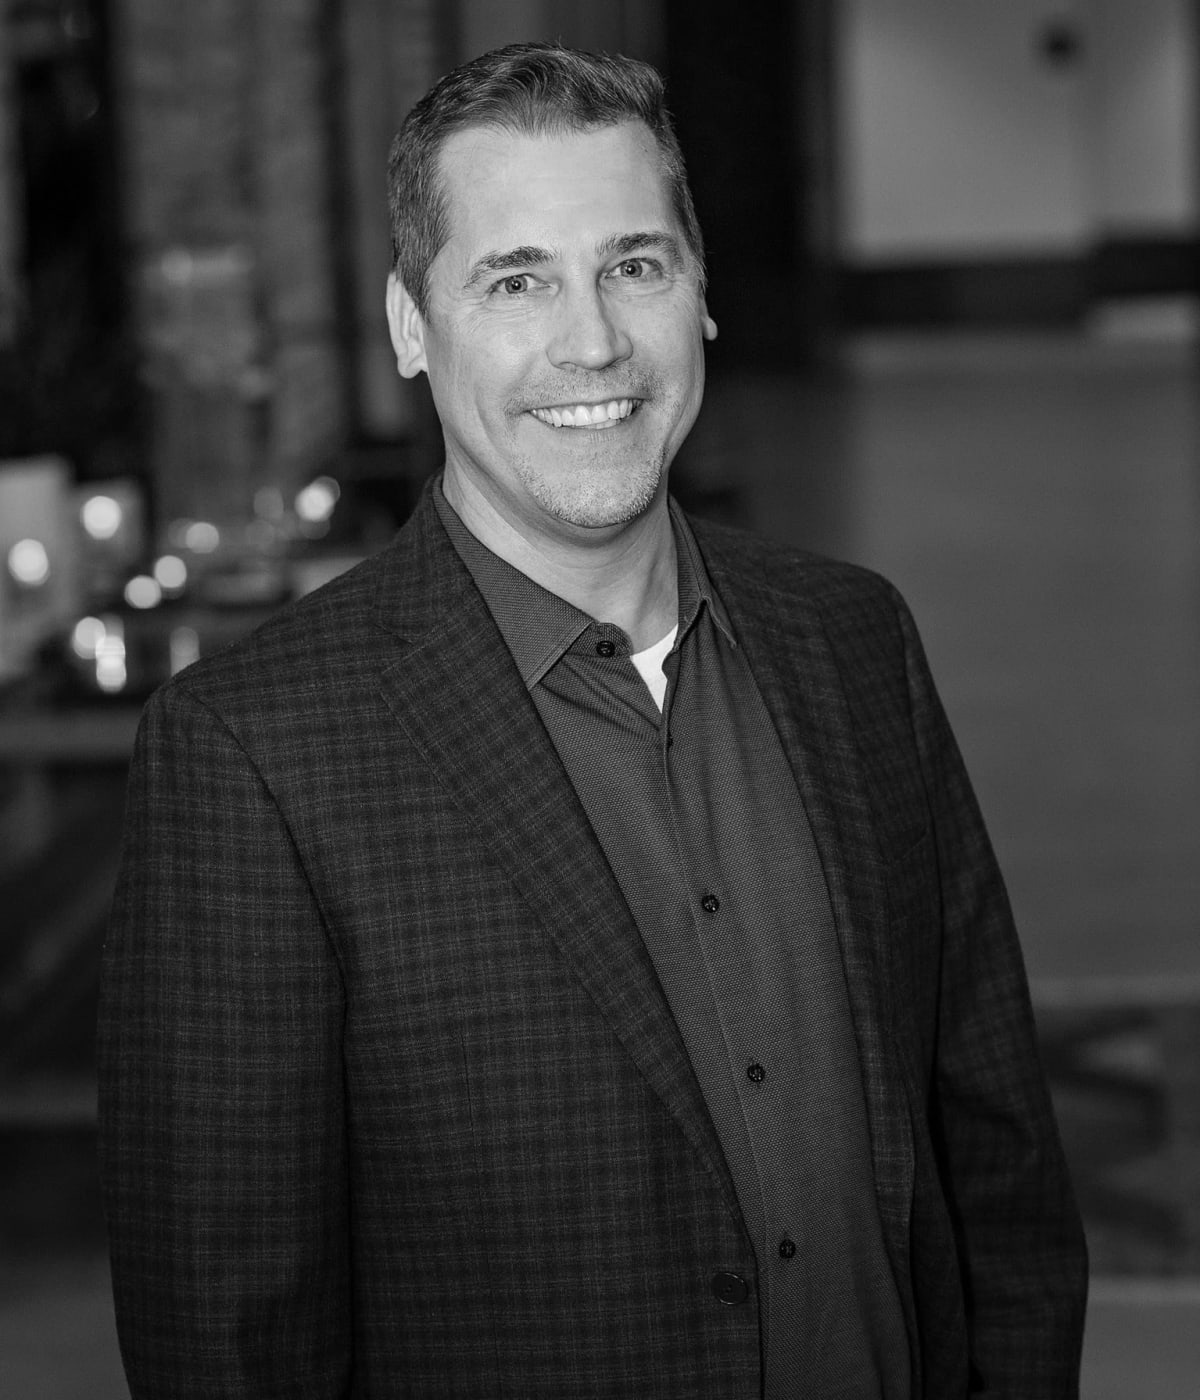 Rex Vanier of Overland Property Group